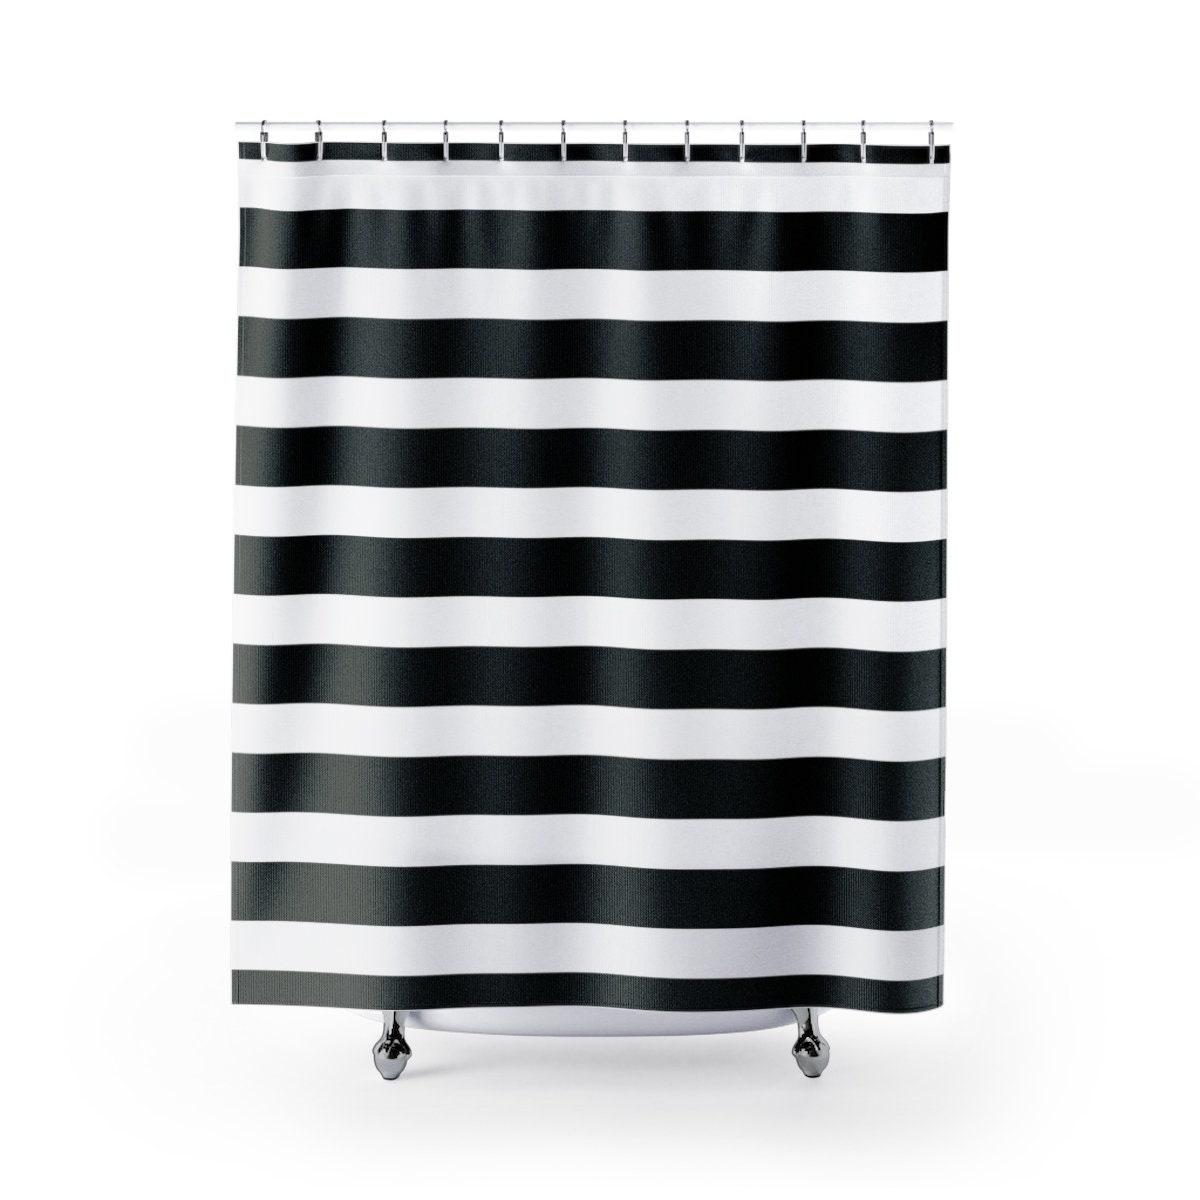 Stripes Shower Curtain Black And White Stripes Shower Decor Bathroom Decor Wide Stripes